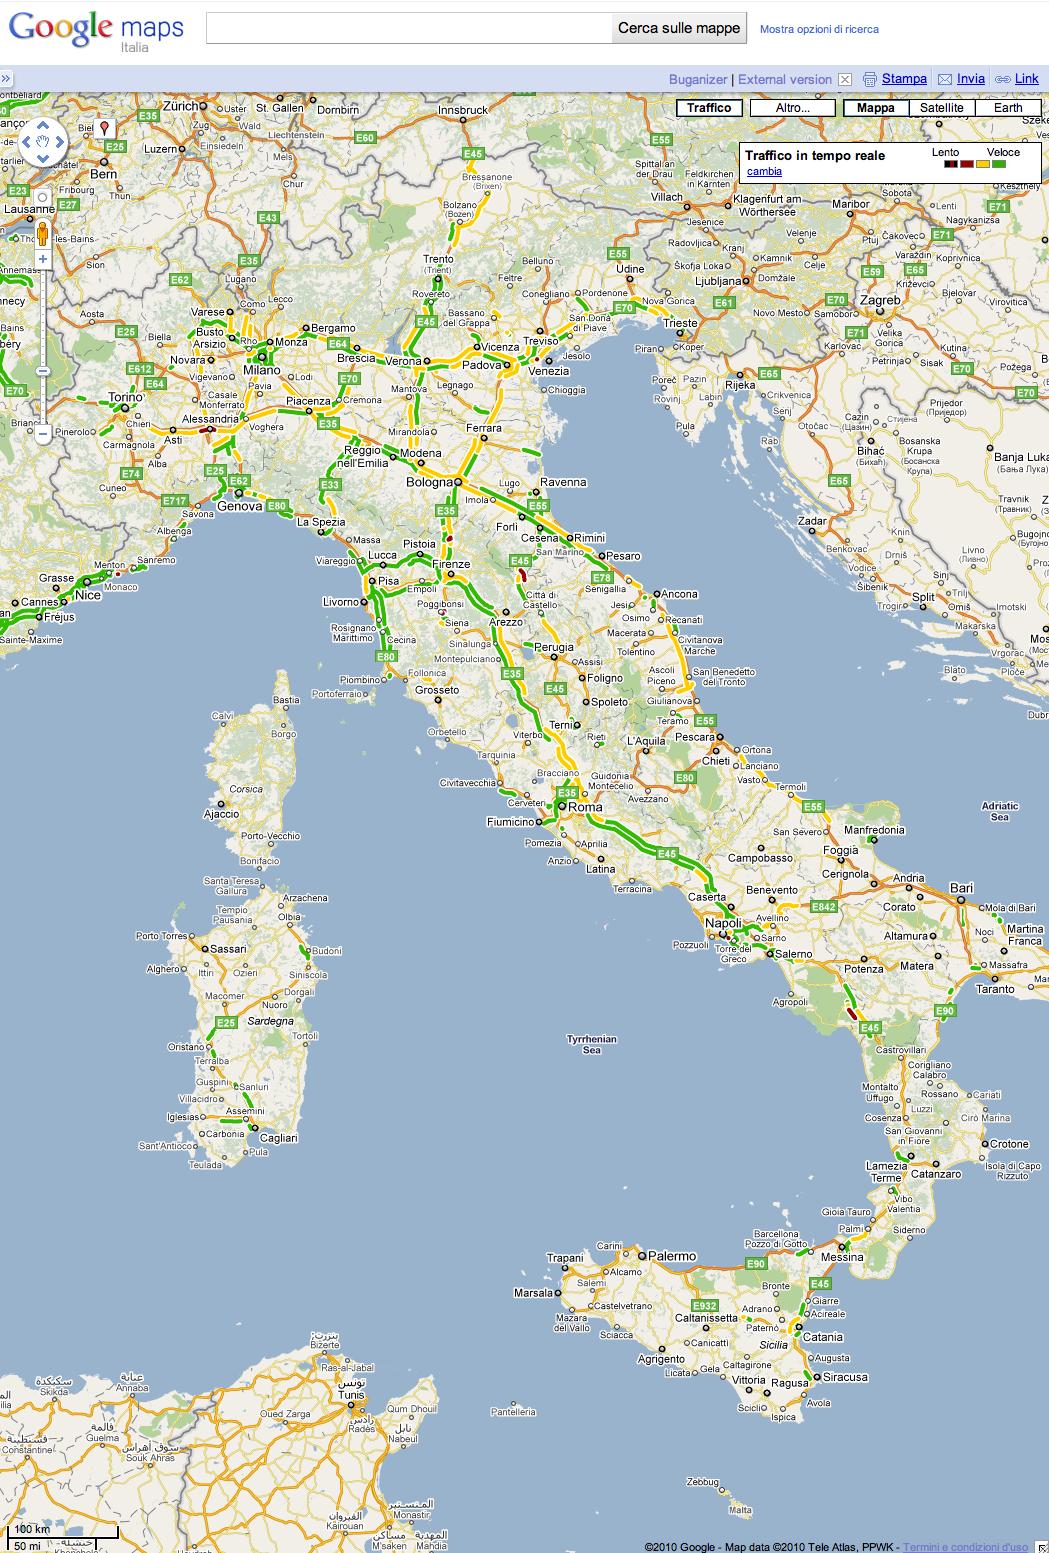 Cartina Italia Google Maps.Le Technoblog Du Lac Google Maps Trafic En Temps Reel Pour L Italie O